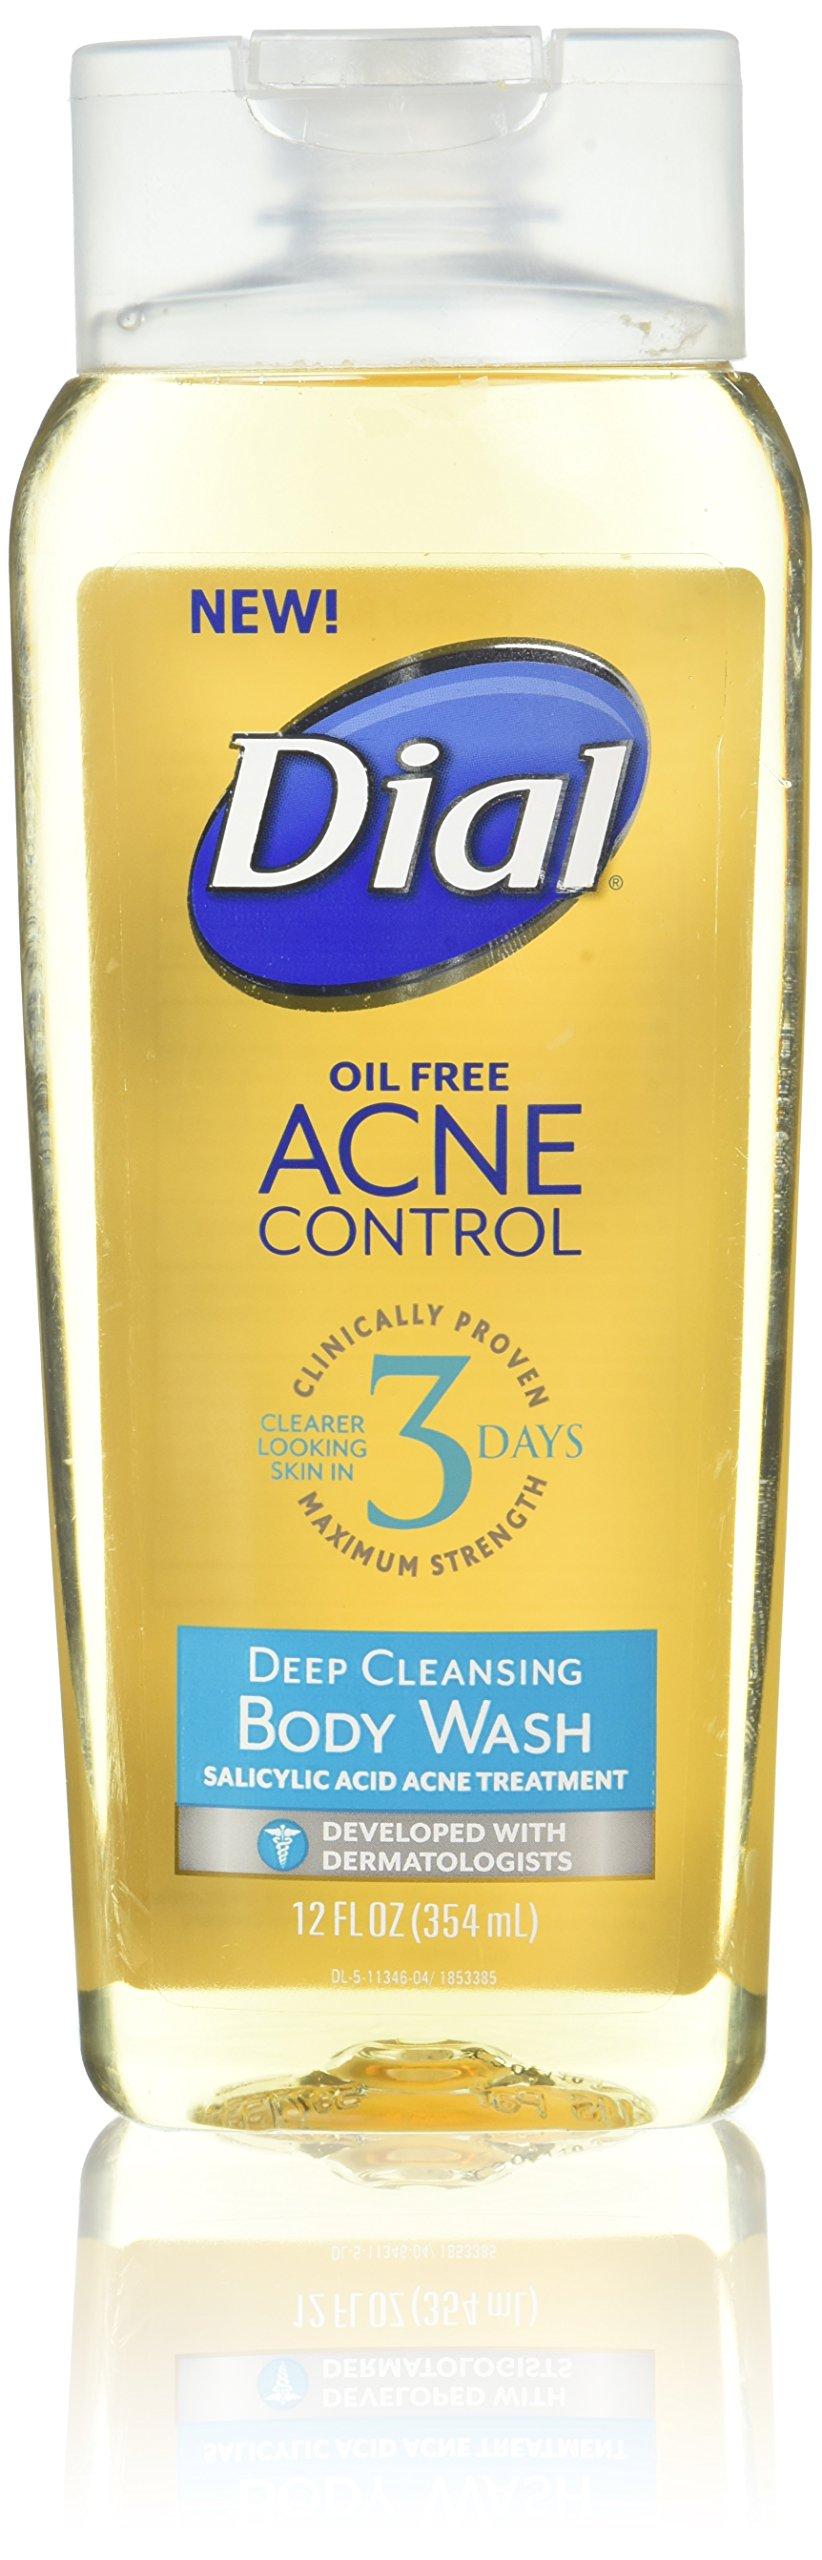 amazon com dial oil free acne control face wash 7 5 fl oz pack